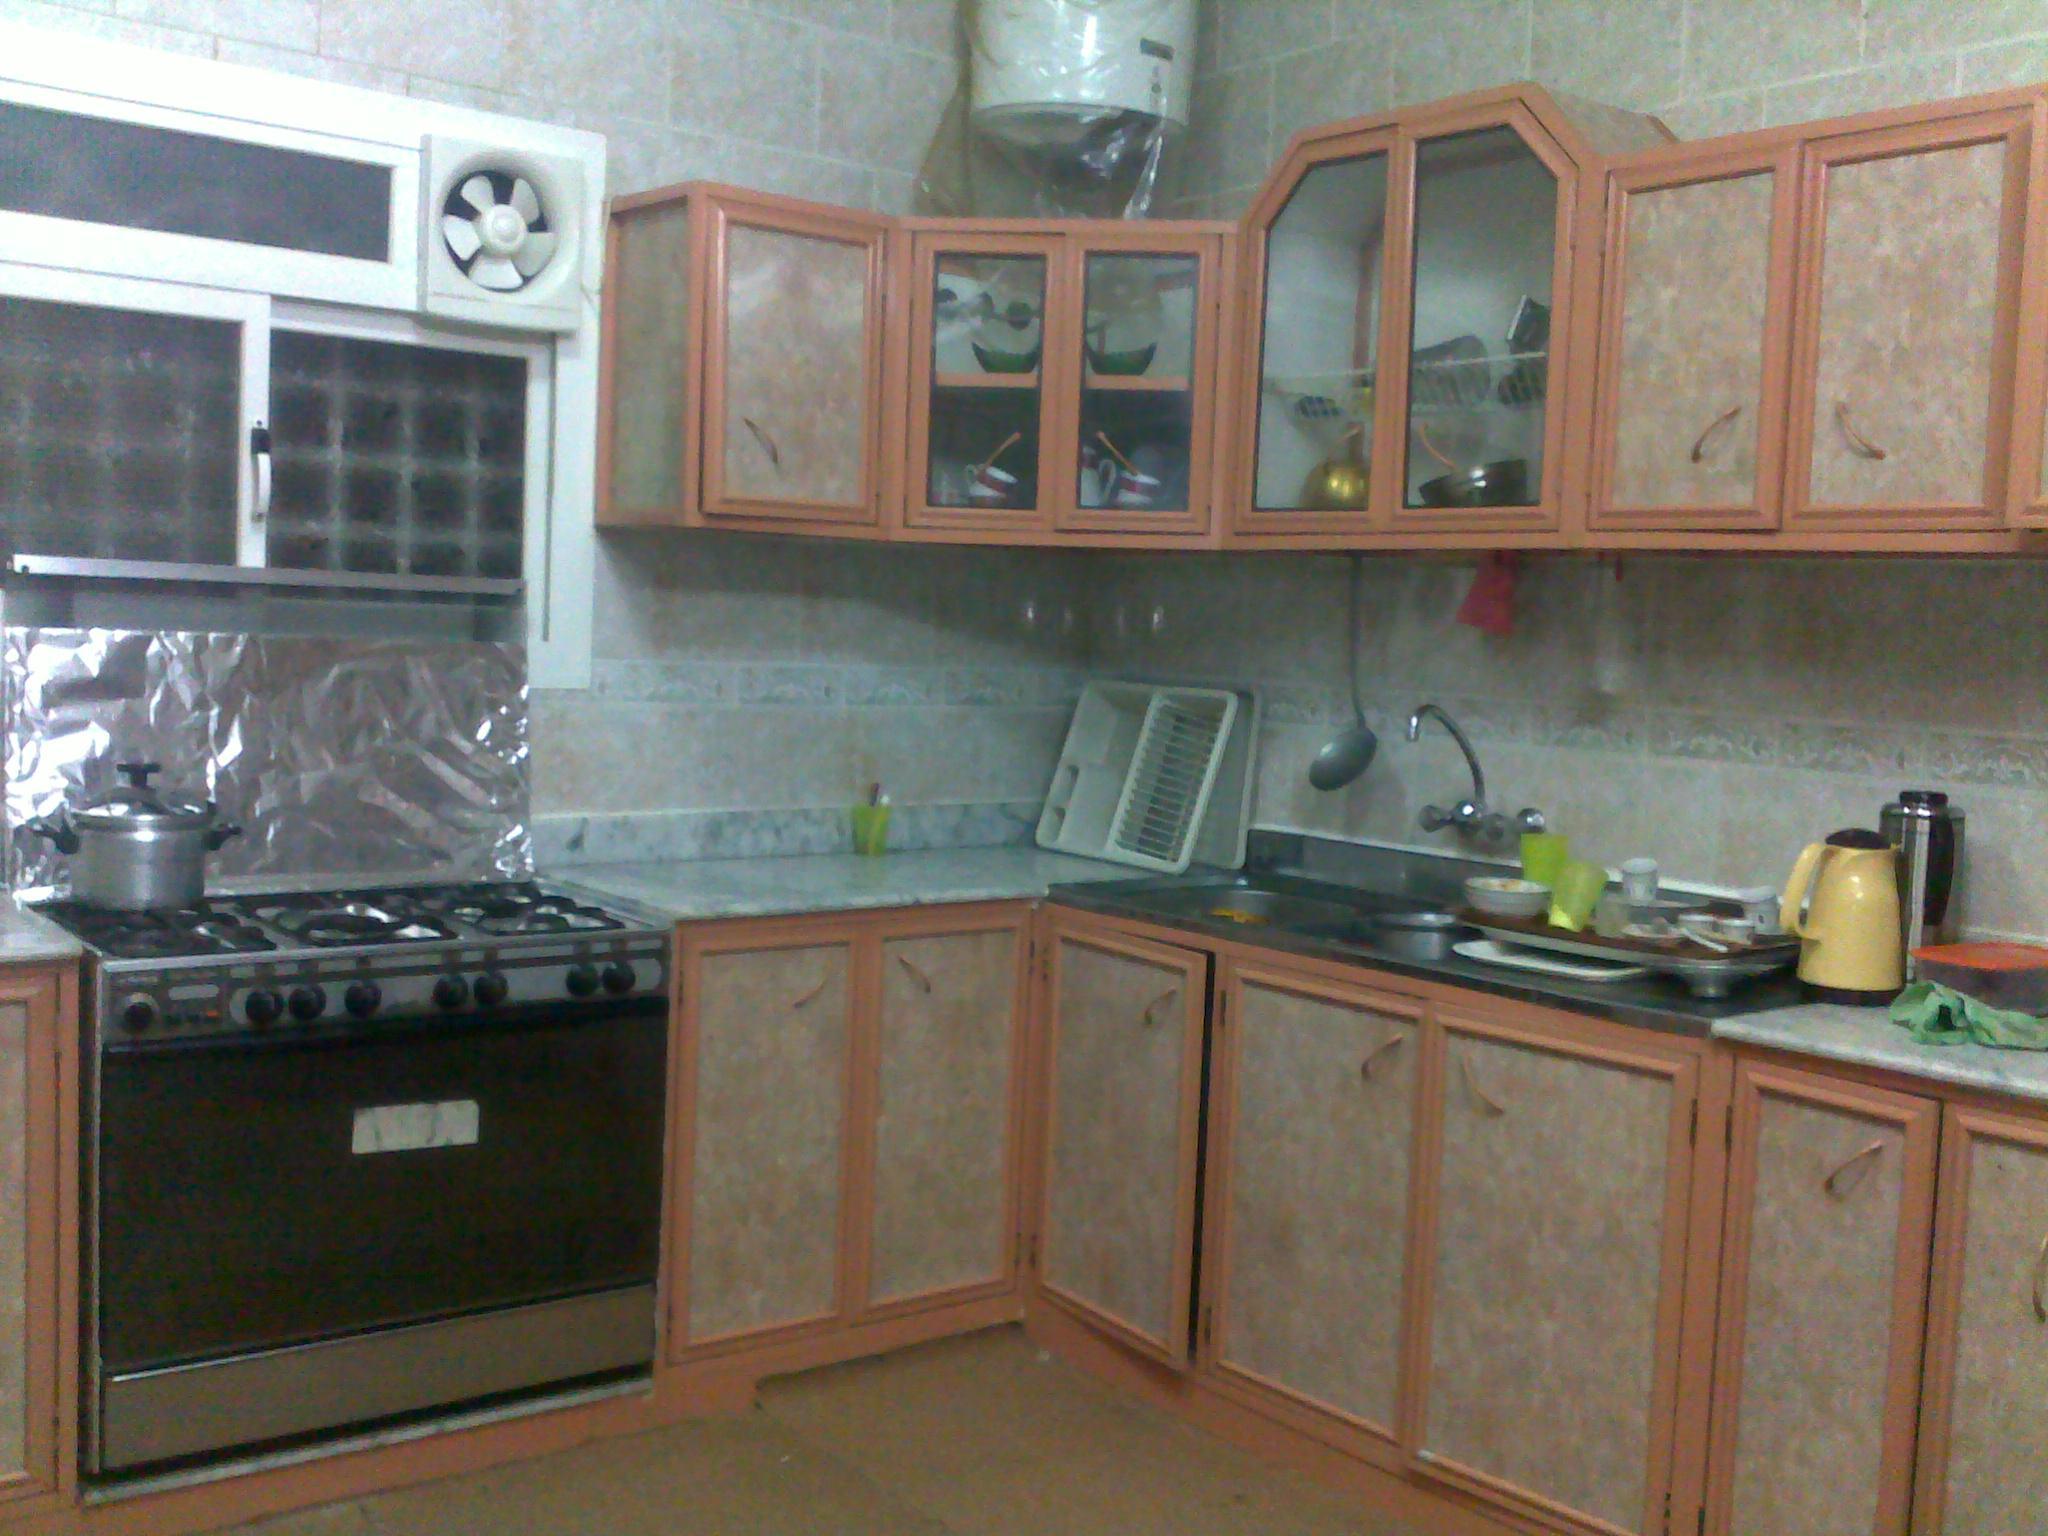 aa3662e56 مطبخي بعد التنظيف والترتيب - عالم حواء